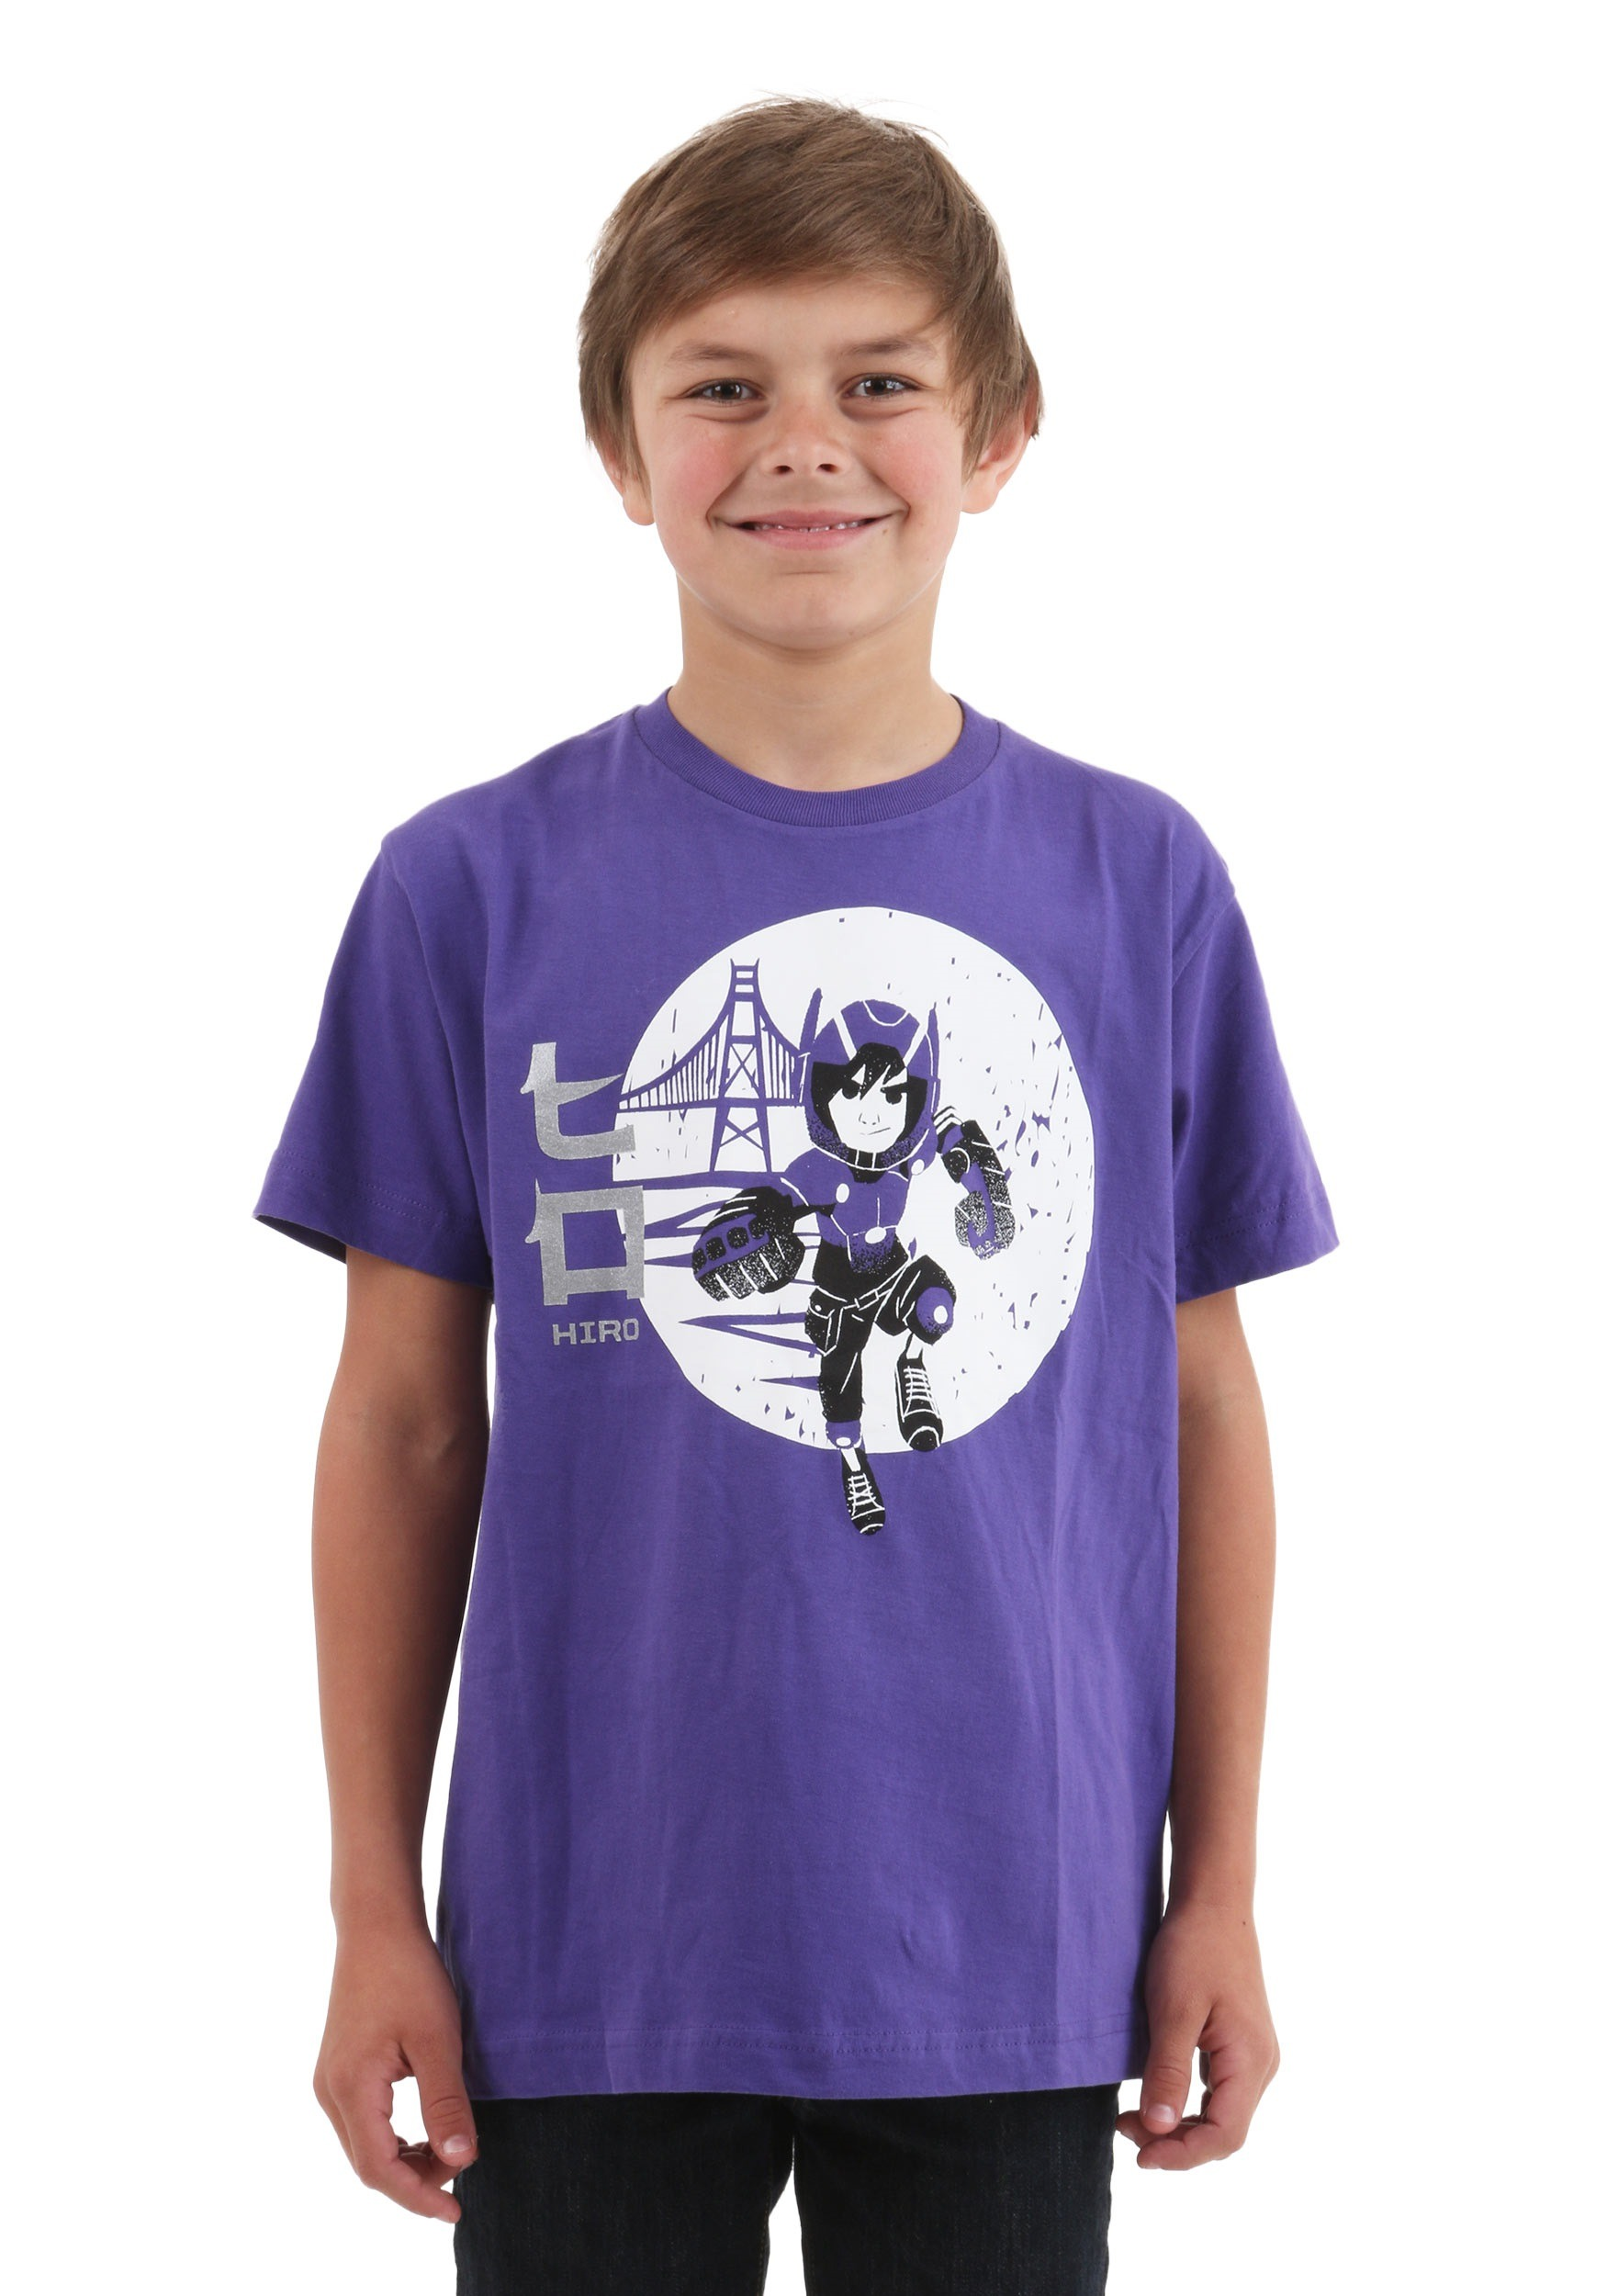 Kids Big Hero 6 Hiro Burst T-Shirt MAHI038YS3